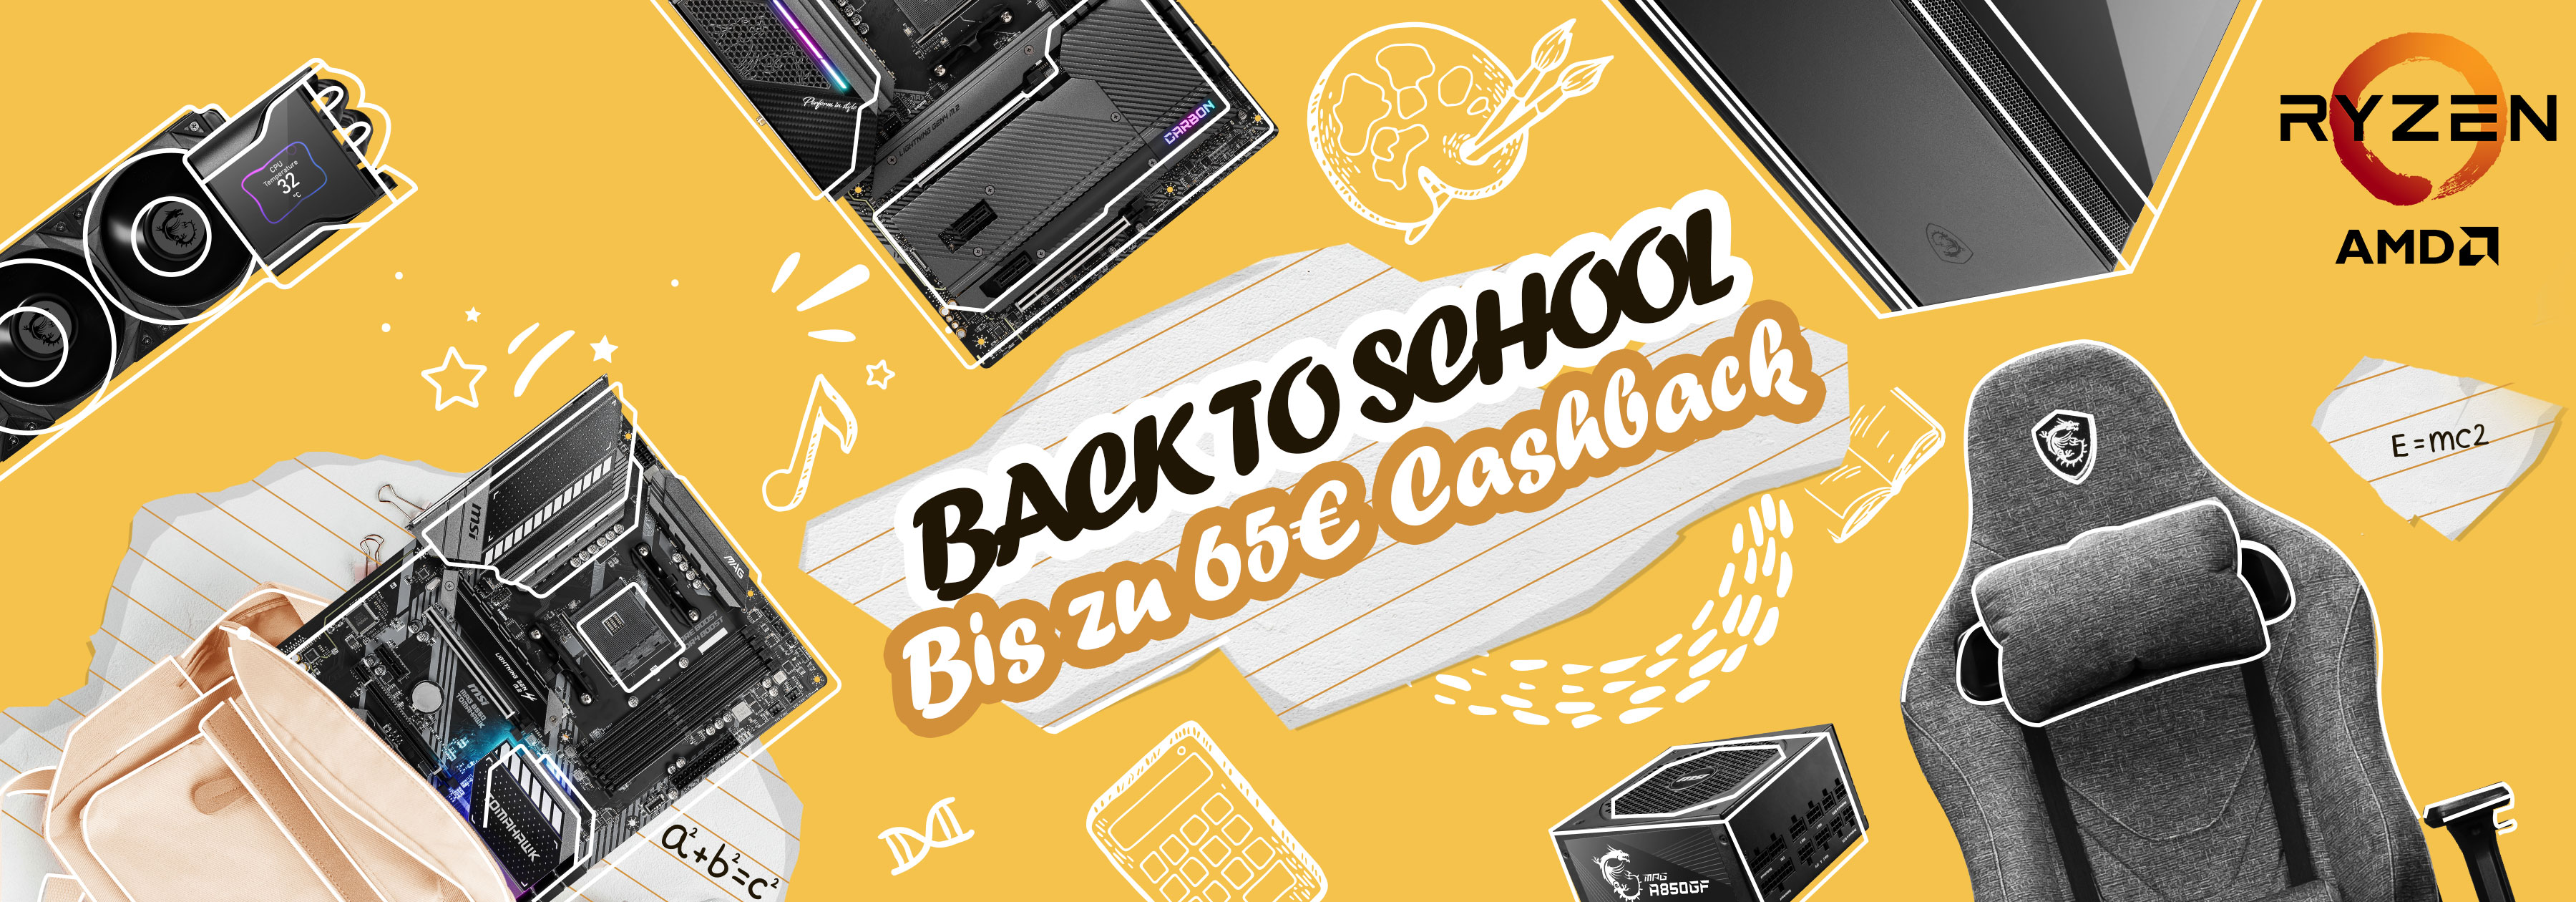 Back to School Cashback